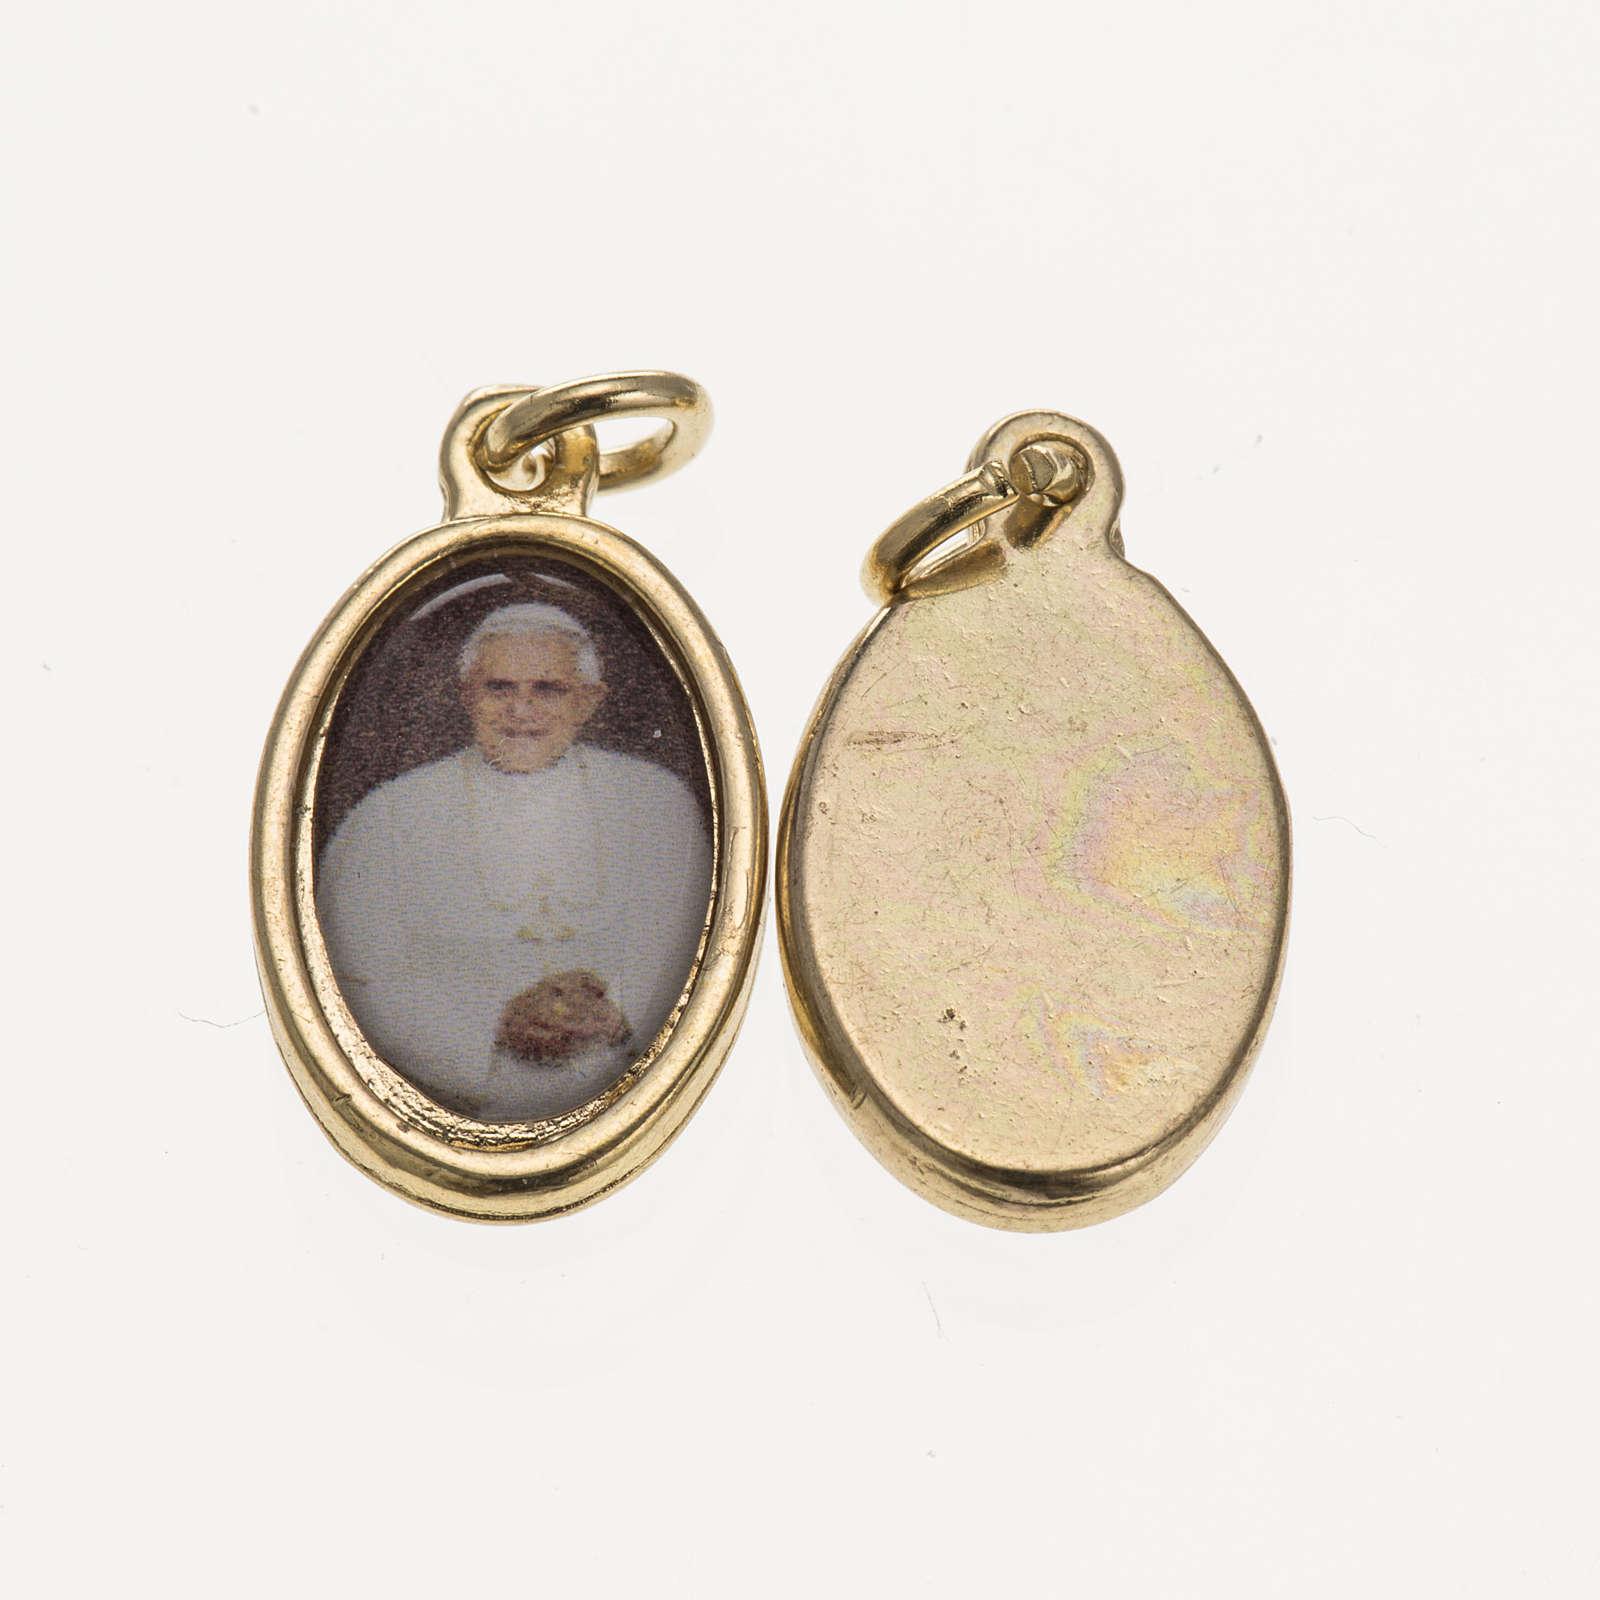 Medal Benedict XVI in golden metal and resin 1.5x1cm 4